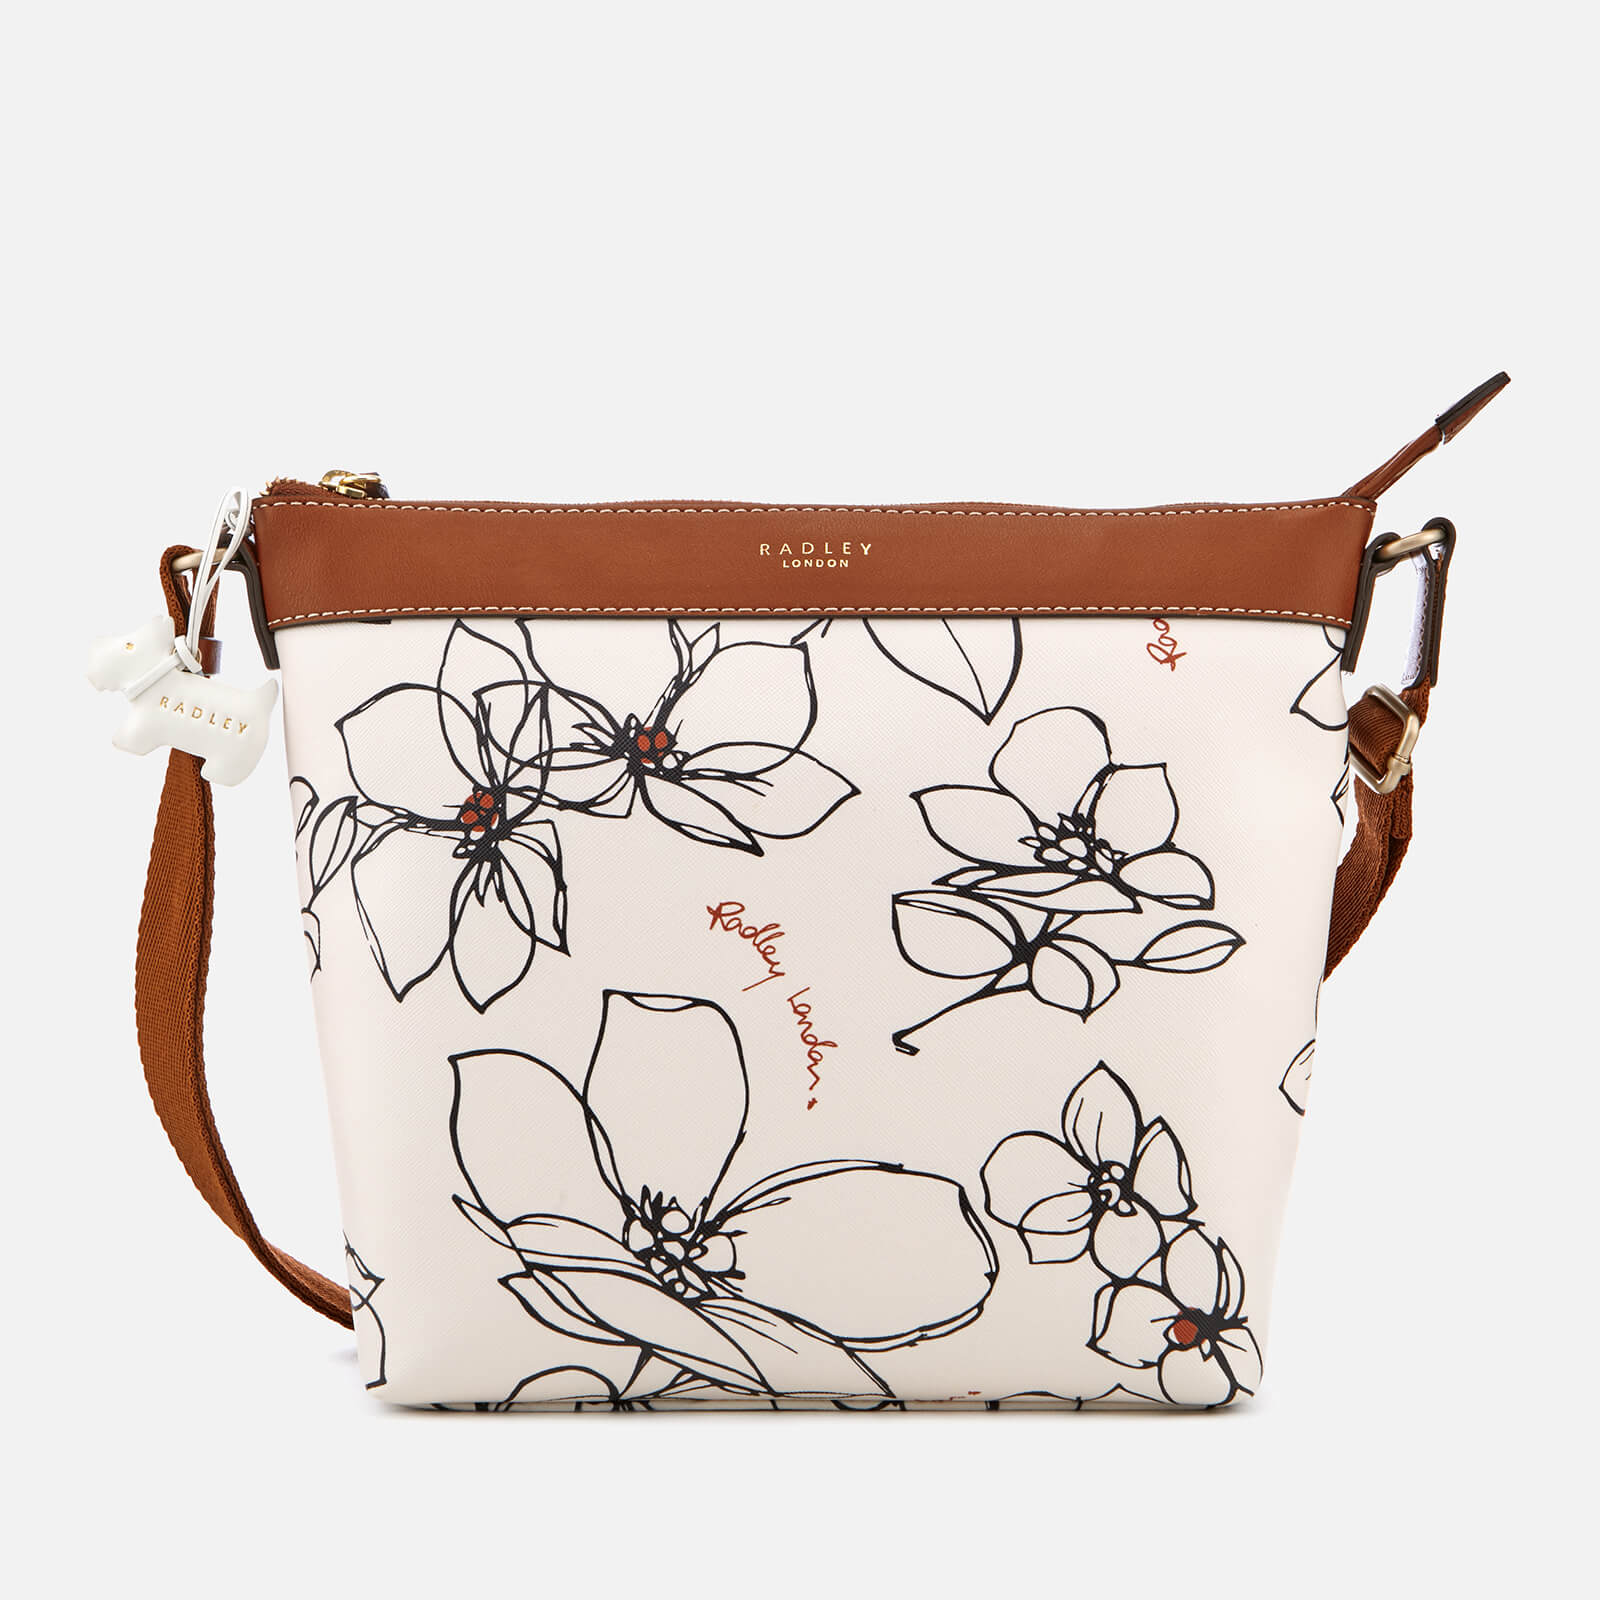 3a98579efd Radley Women's Linear Flower Medium Zip-Top Cross Body Bag - Chalk